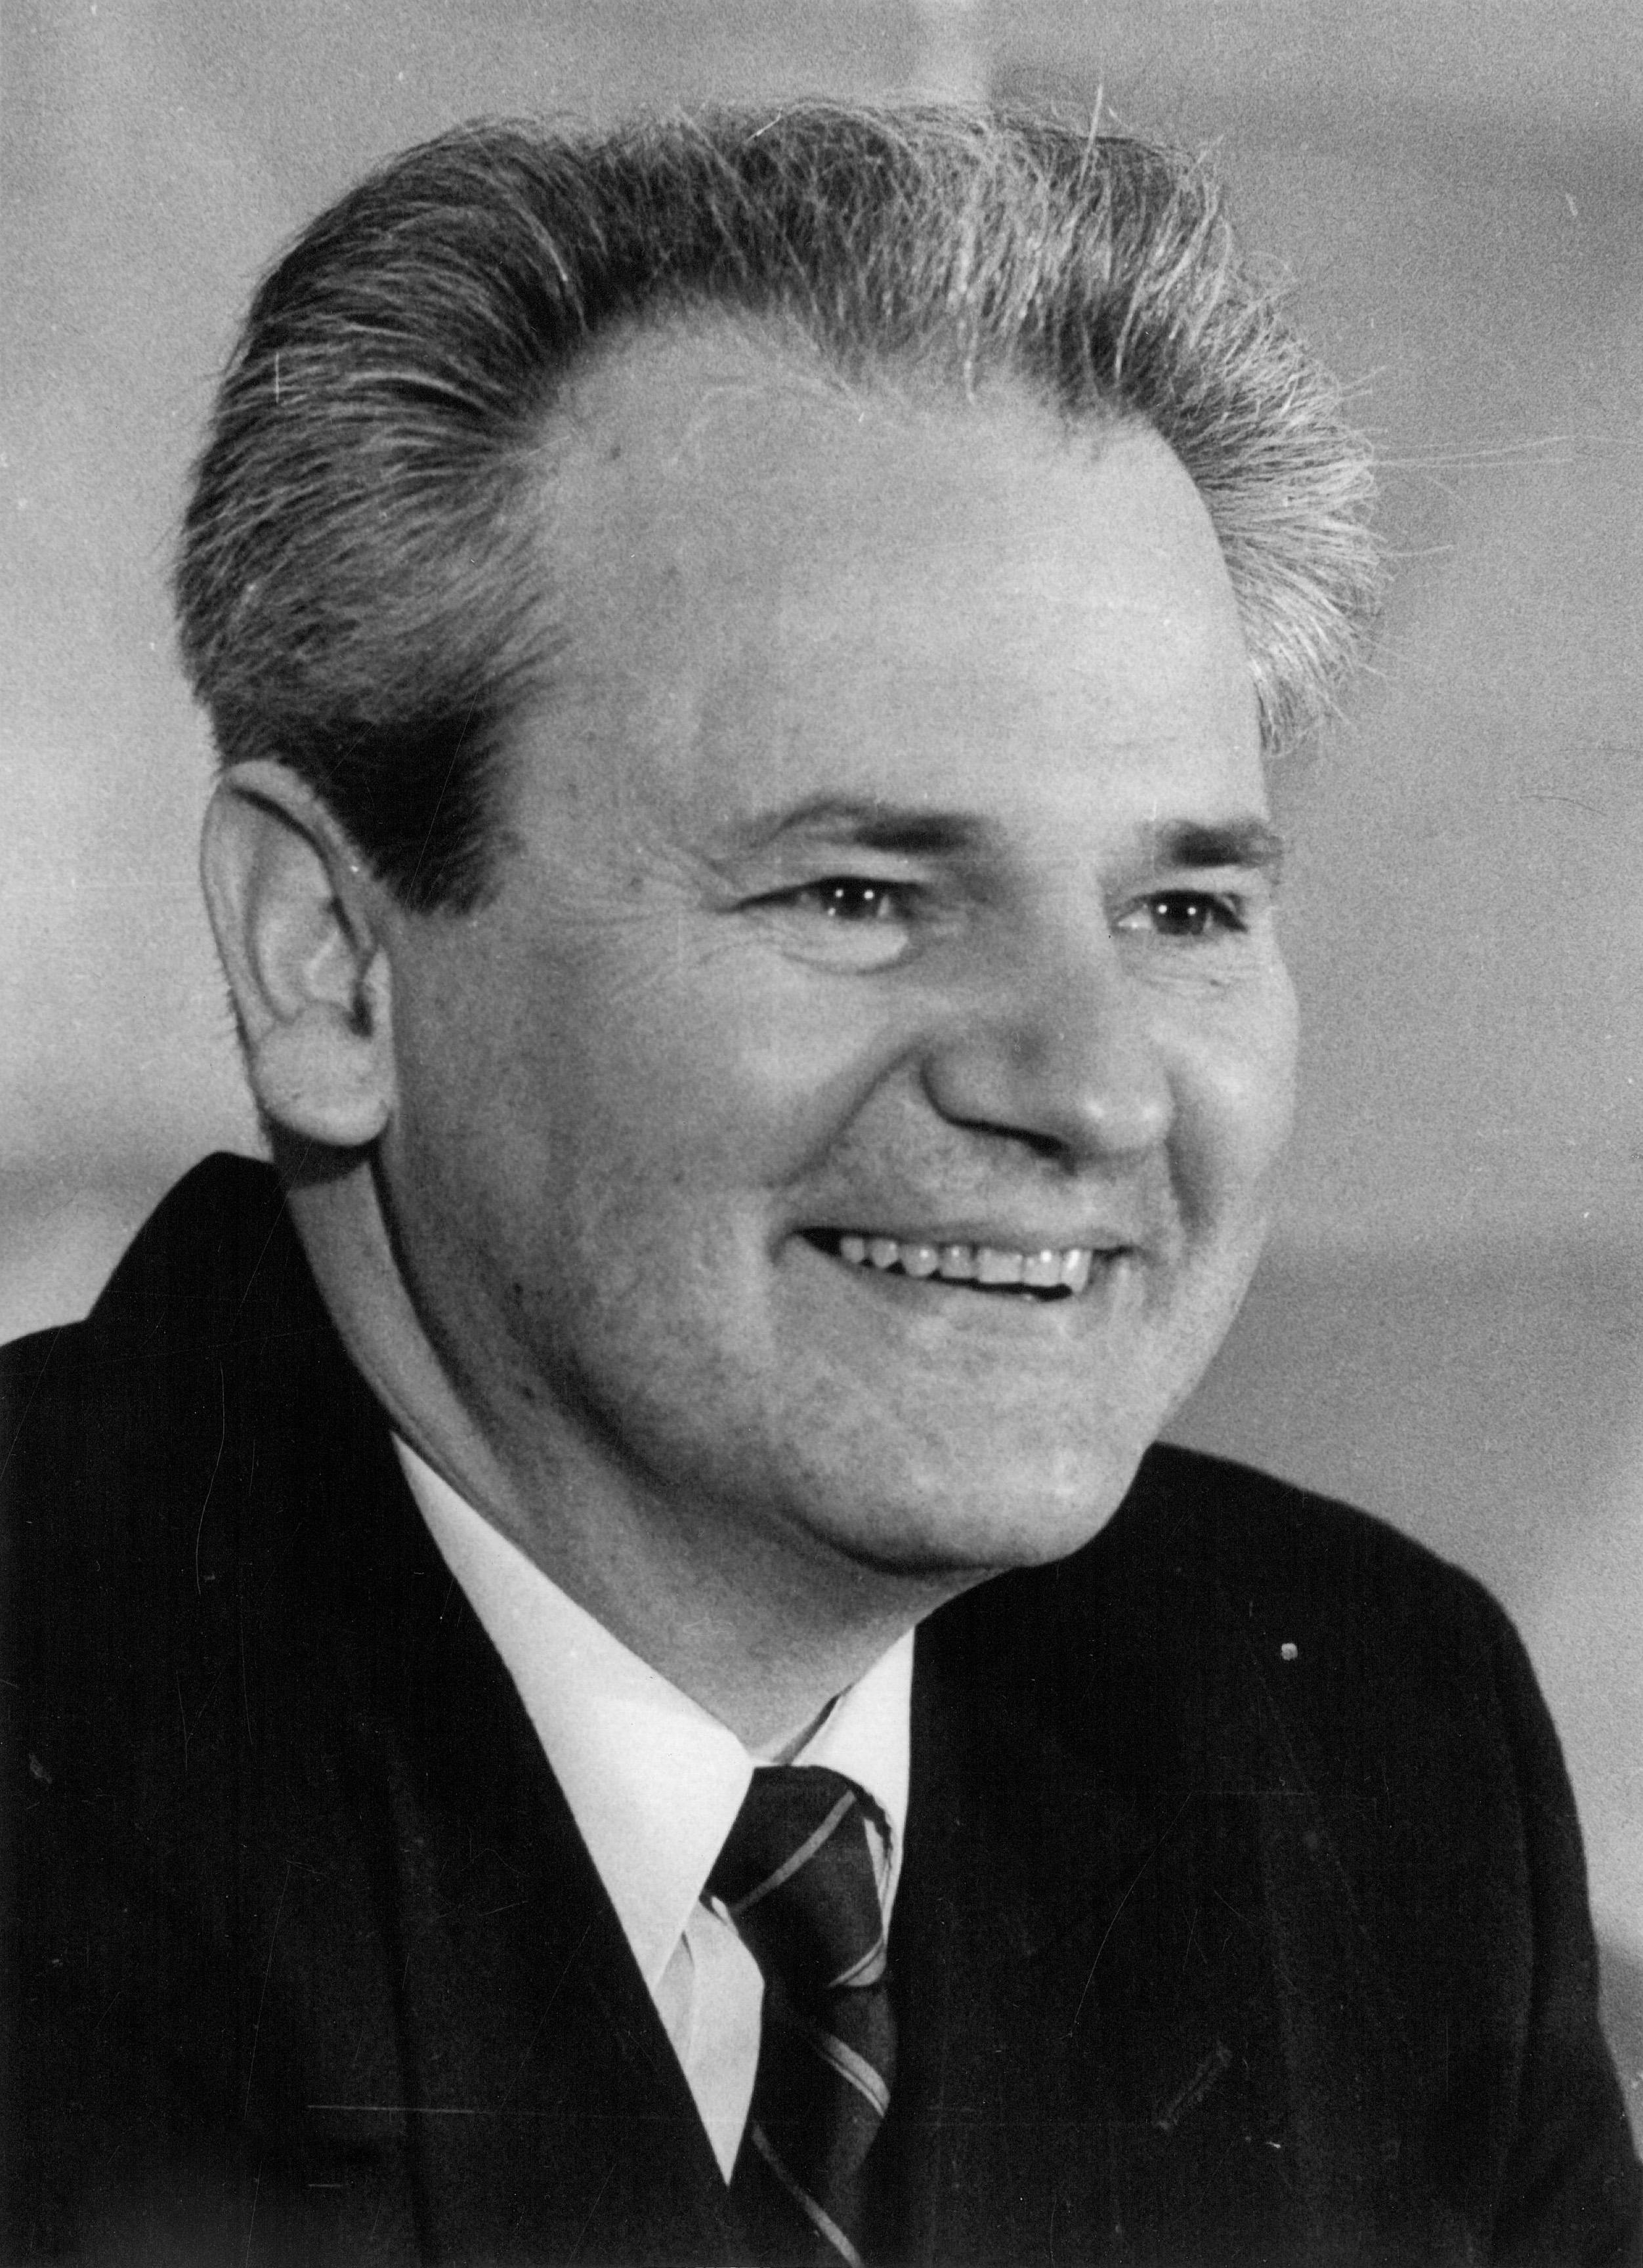 File:Stevan Kragujevic, Slobodan Milosevic, portret.jpg